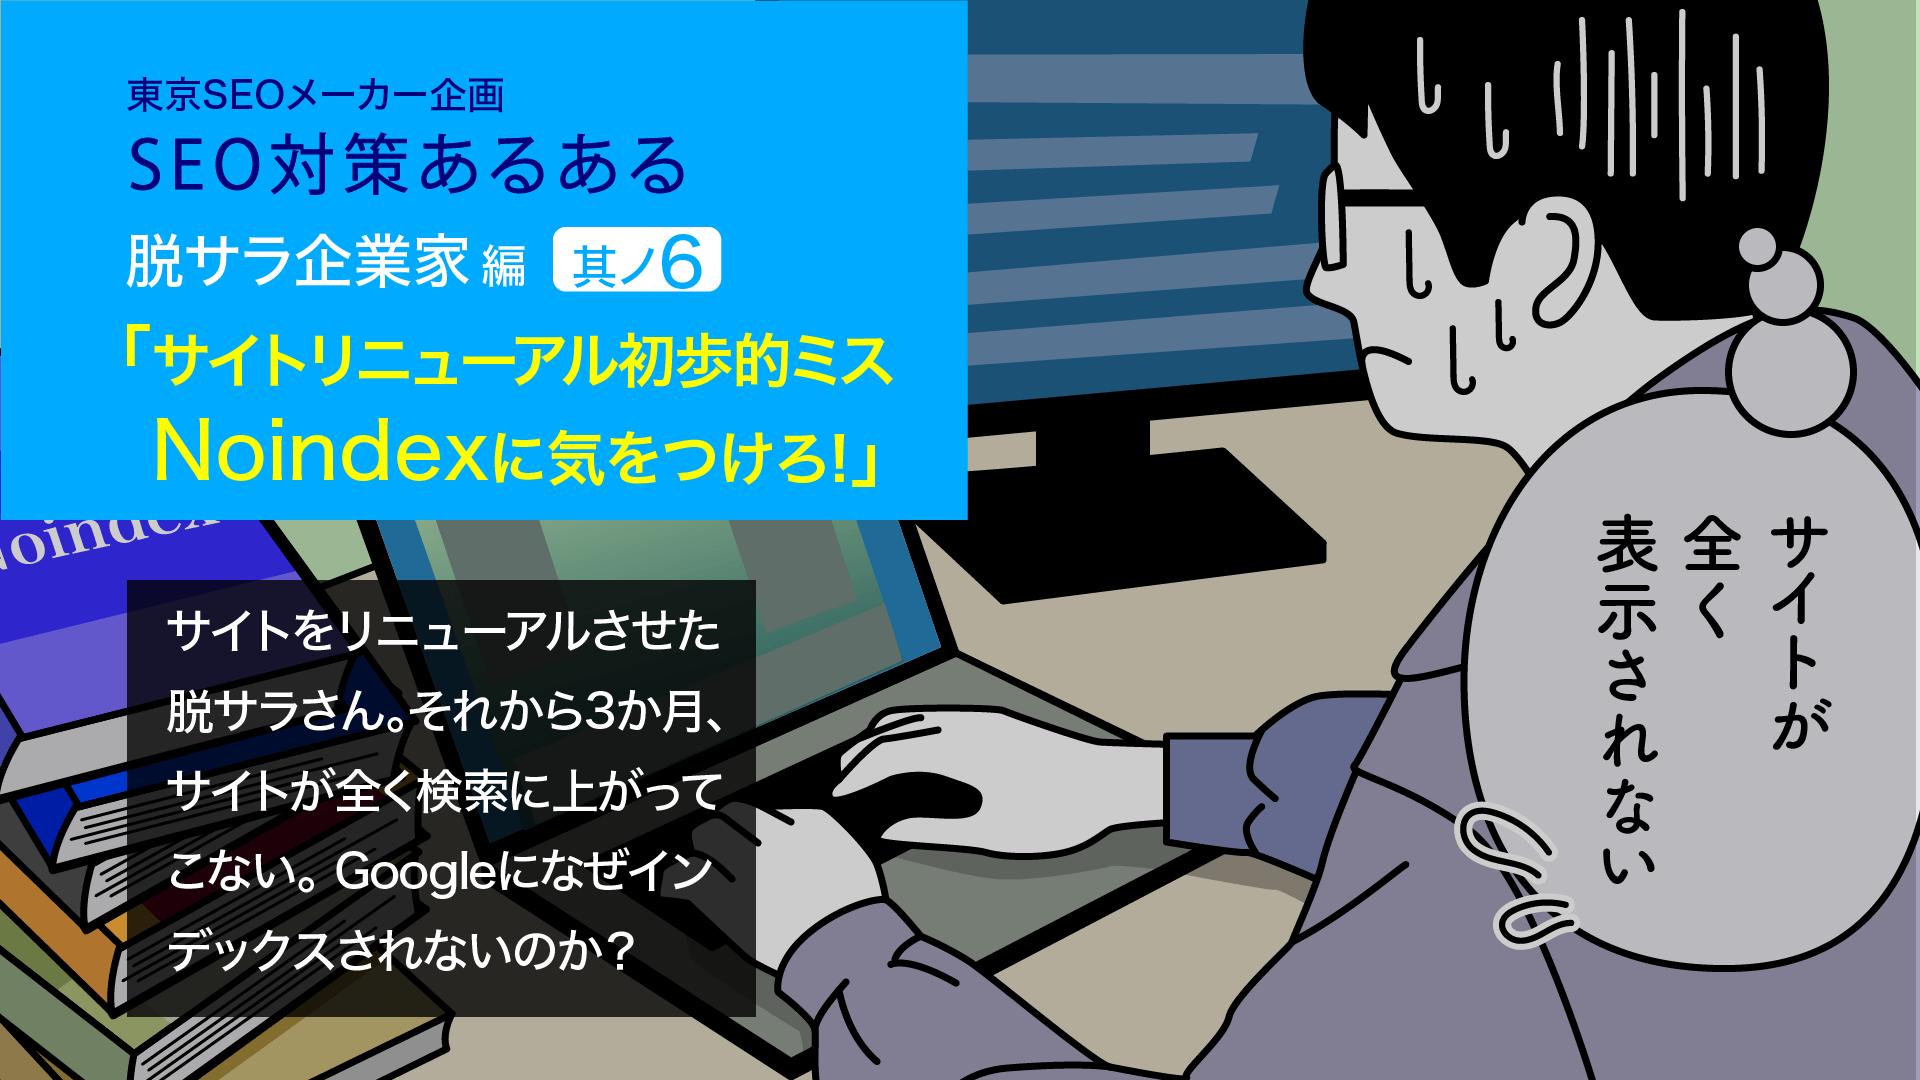 SEO対策漫画ーNOINDEXに気を付けろ①